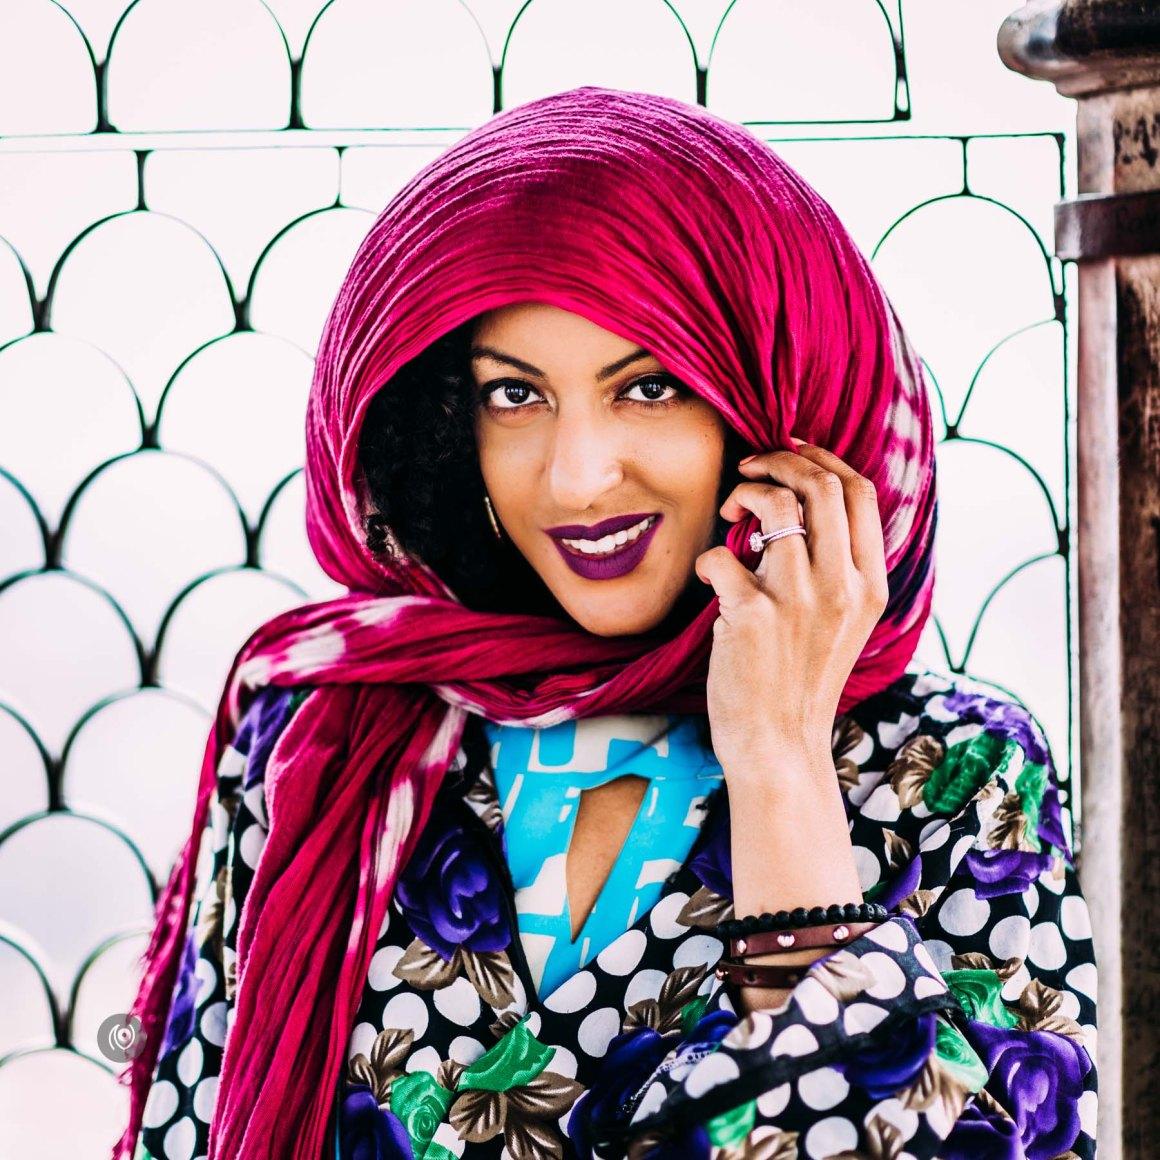 Experience Collector, Lifestyle, Lifestyle Blogger, Lifestyle Blogger India, Lifestyle Photographer India, Luxury Blogger, Luxury Blogger India, Luxury Brands, Luxury Photographer, Luxury Photographer India, Naina Redhu, Naina.co, Professional Photographer, Visual Storyteller, Visual Storyteller for Luxury Brands, Influencer, Luxury Influencer, Lifestyle Influencer, Photography Influencer, Brand Storyteller, Visual Storyteller, Jama Masjid, Old Delhi, Delhi Tourism, EyesForDestinations, EyesForIndia, Mosque, Heritage, Monument, Al Jawahar Restaurant, Lunch, Travel